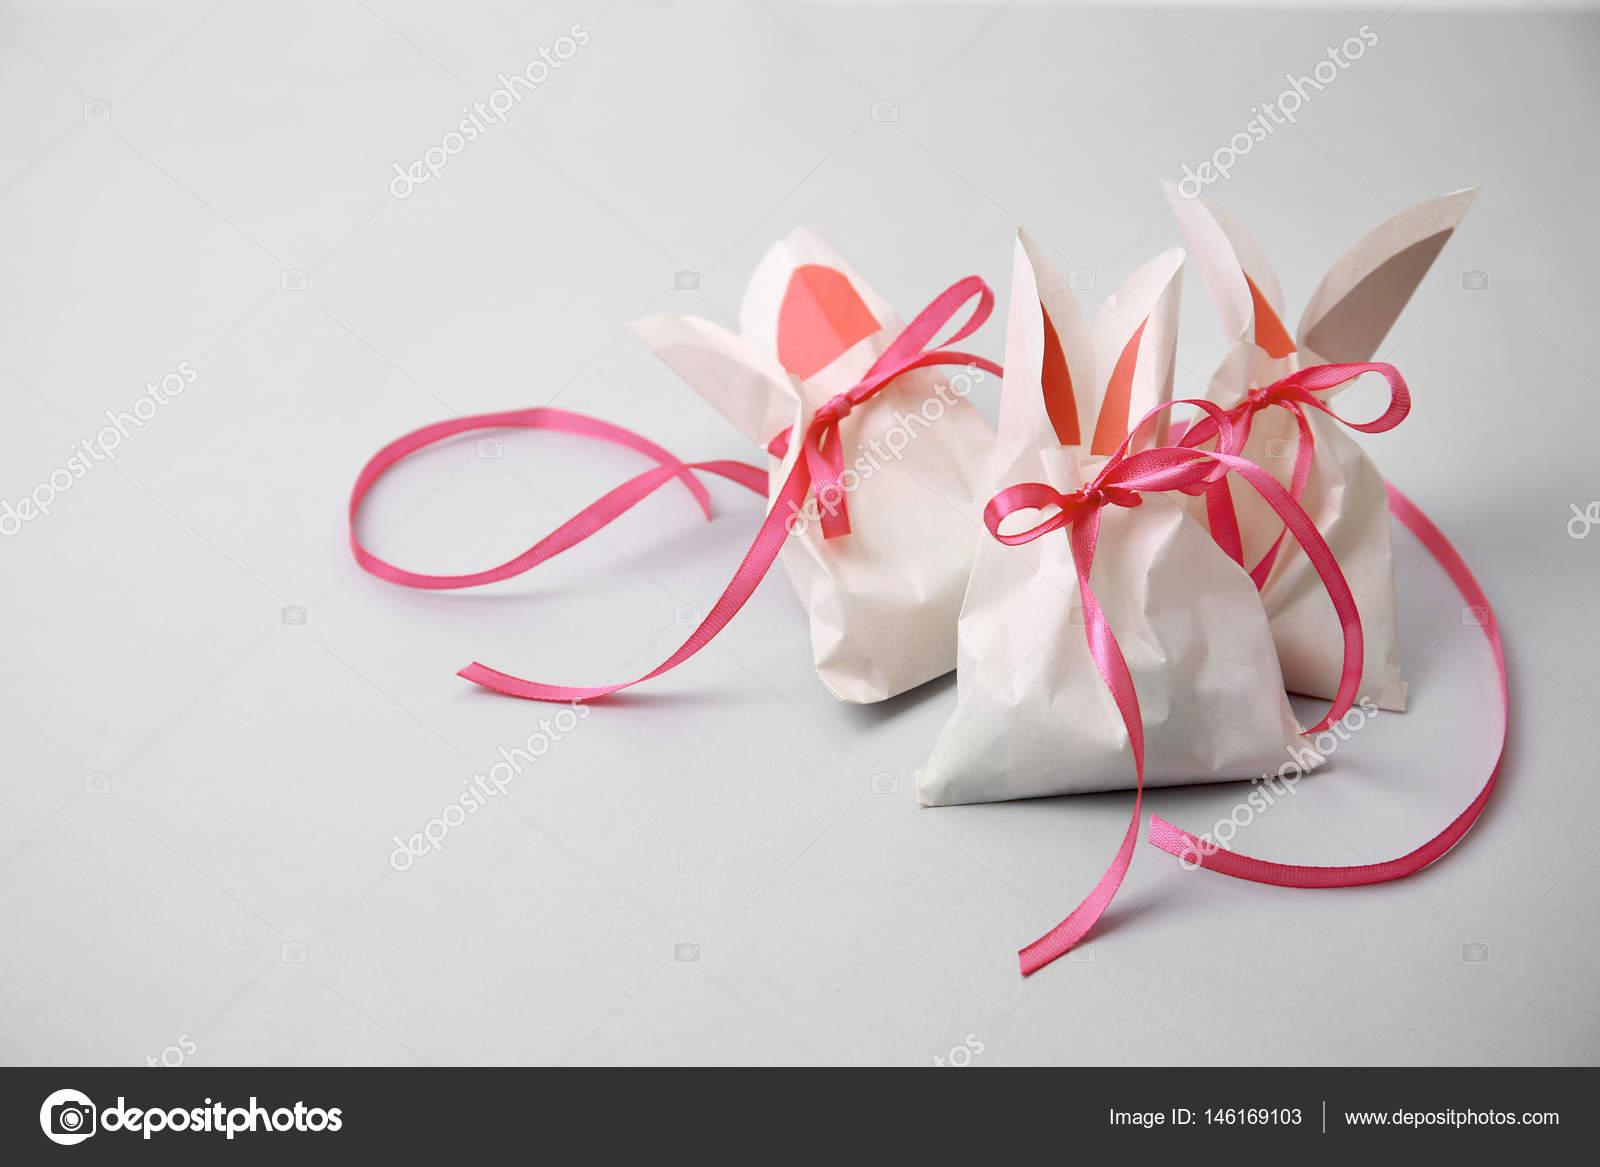 592a47c64 Bolsas de papel en forma de conejos de Pascua — Fotos de Stock ...